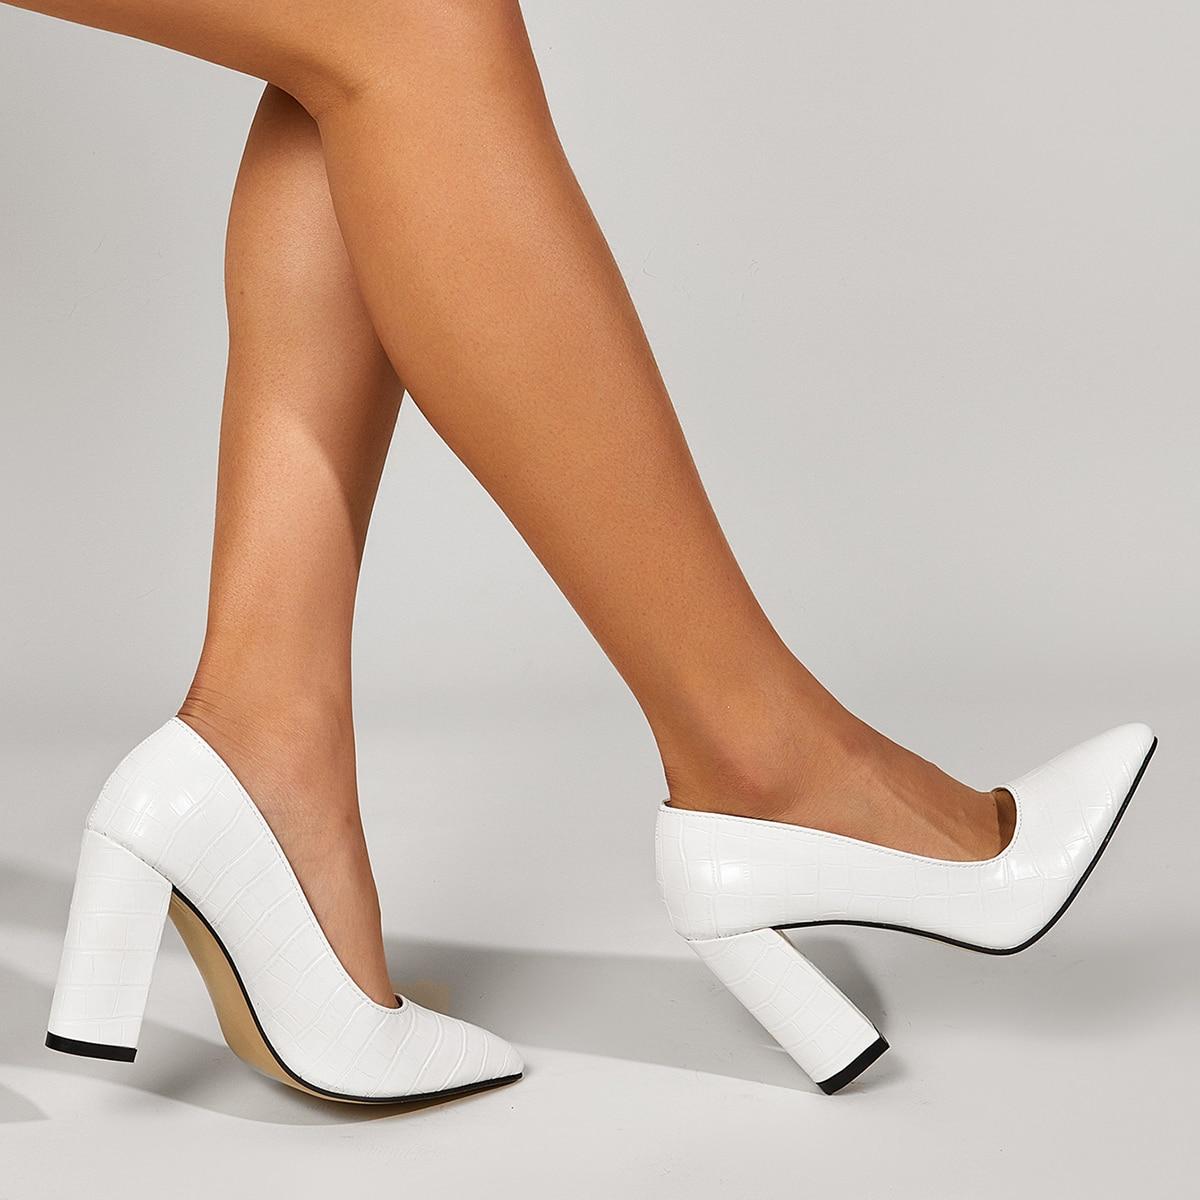 Туфли-лодочки на массивном каблуке с крокодиловым узором